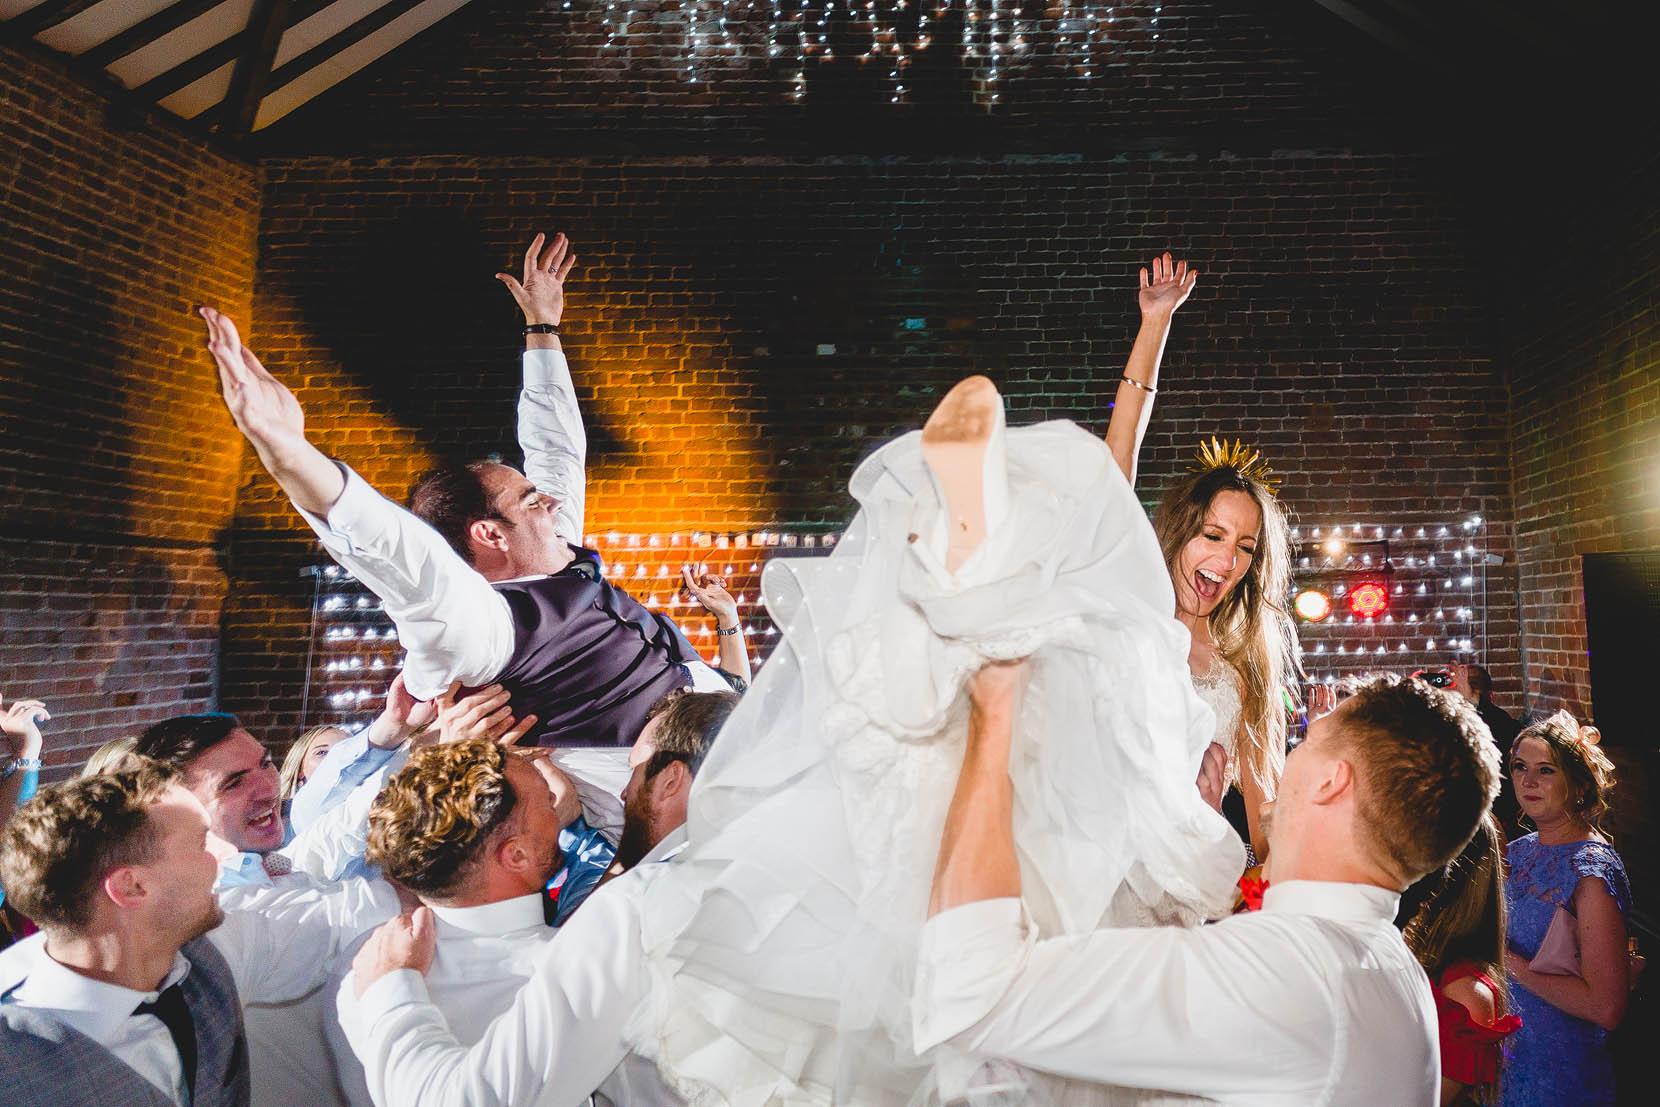 wedding atr octagon barn james and jasmine on an epic dancefloor